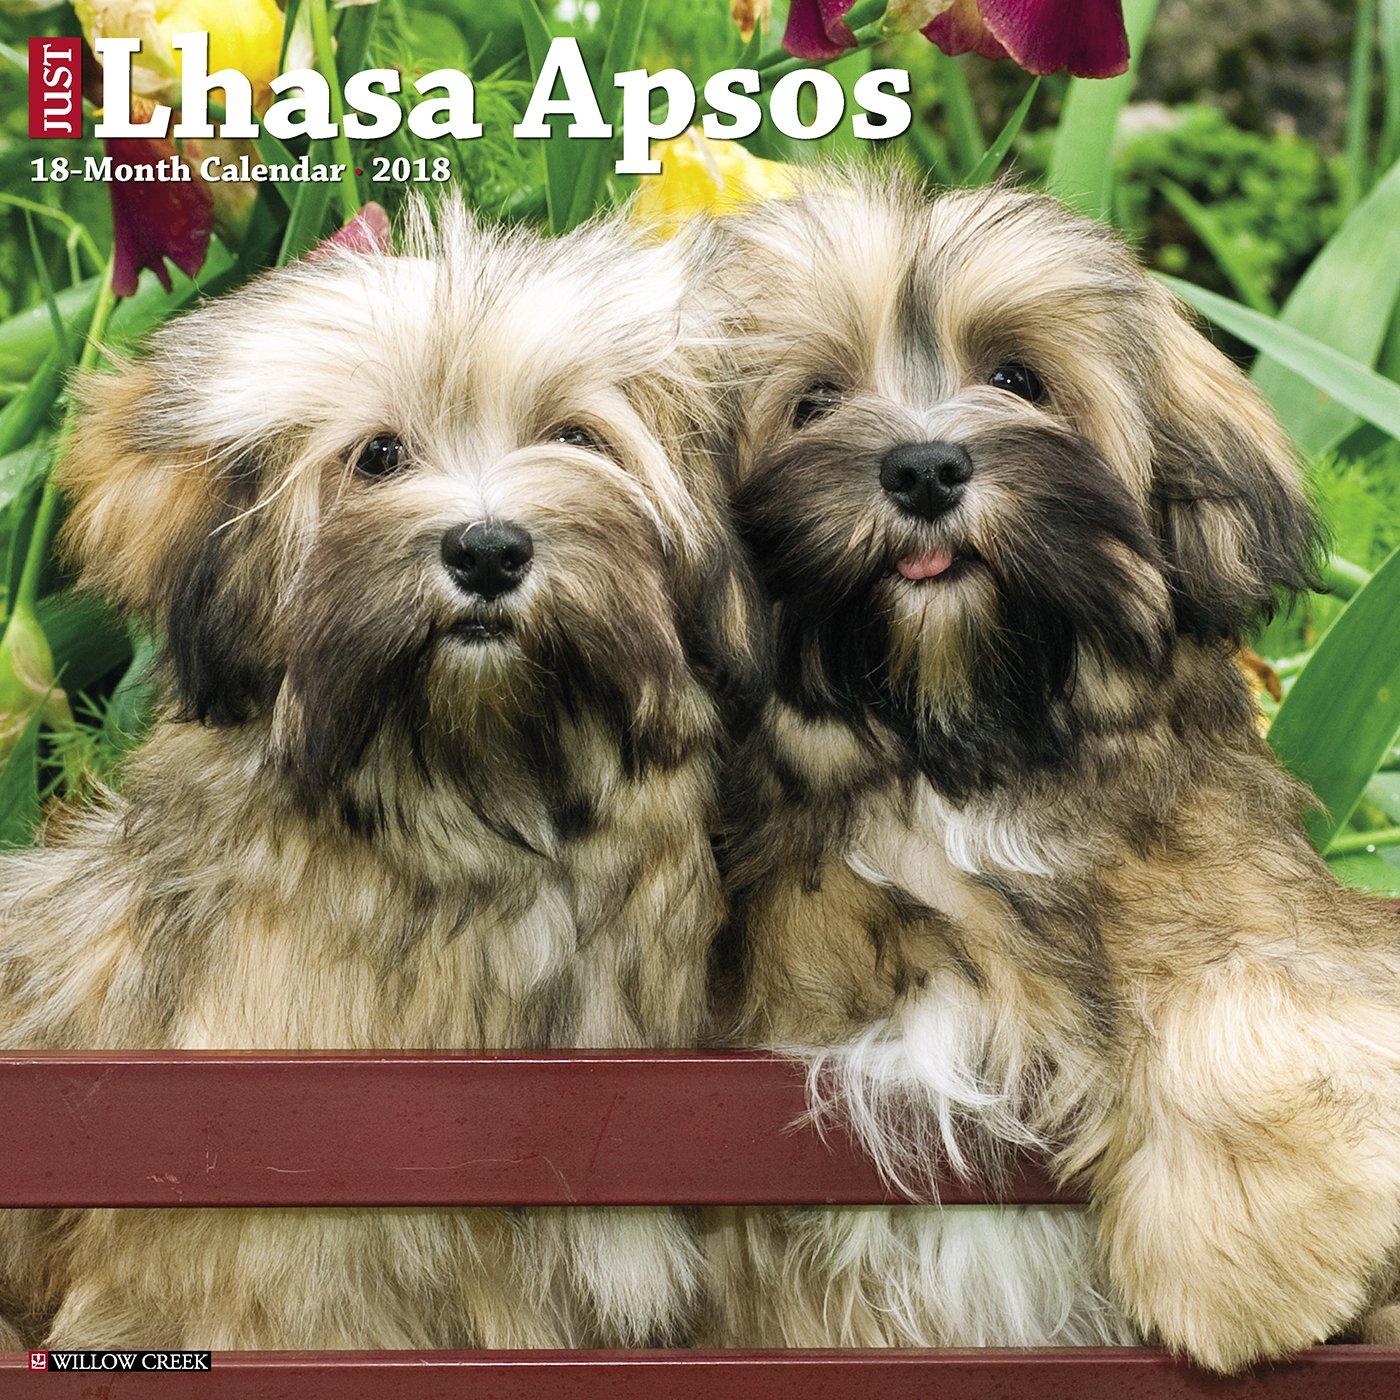 just-lhasa-apsos-2018-calendar